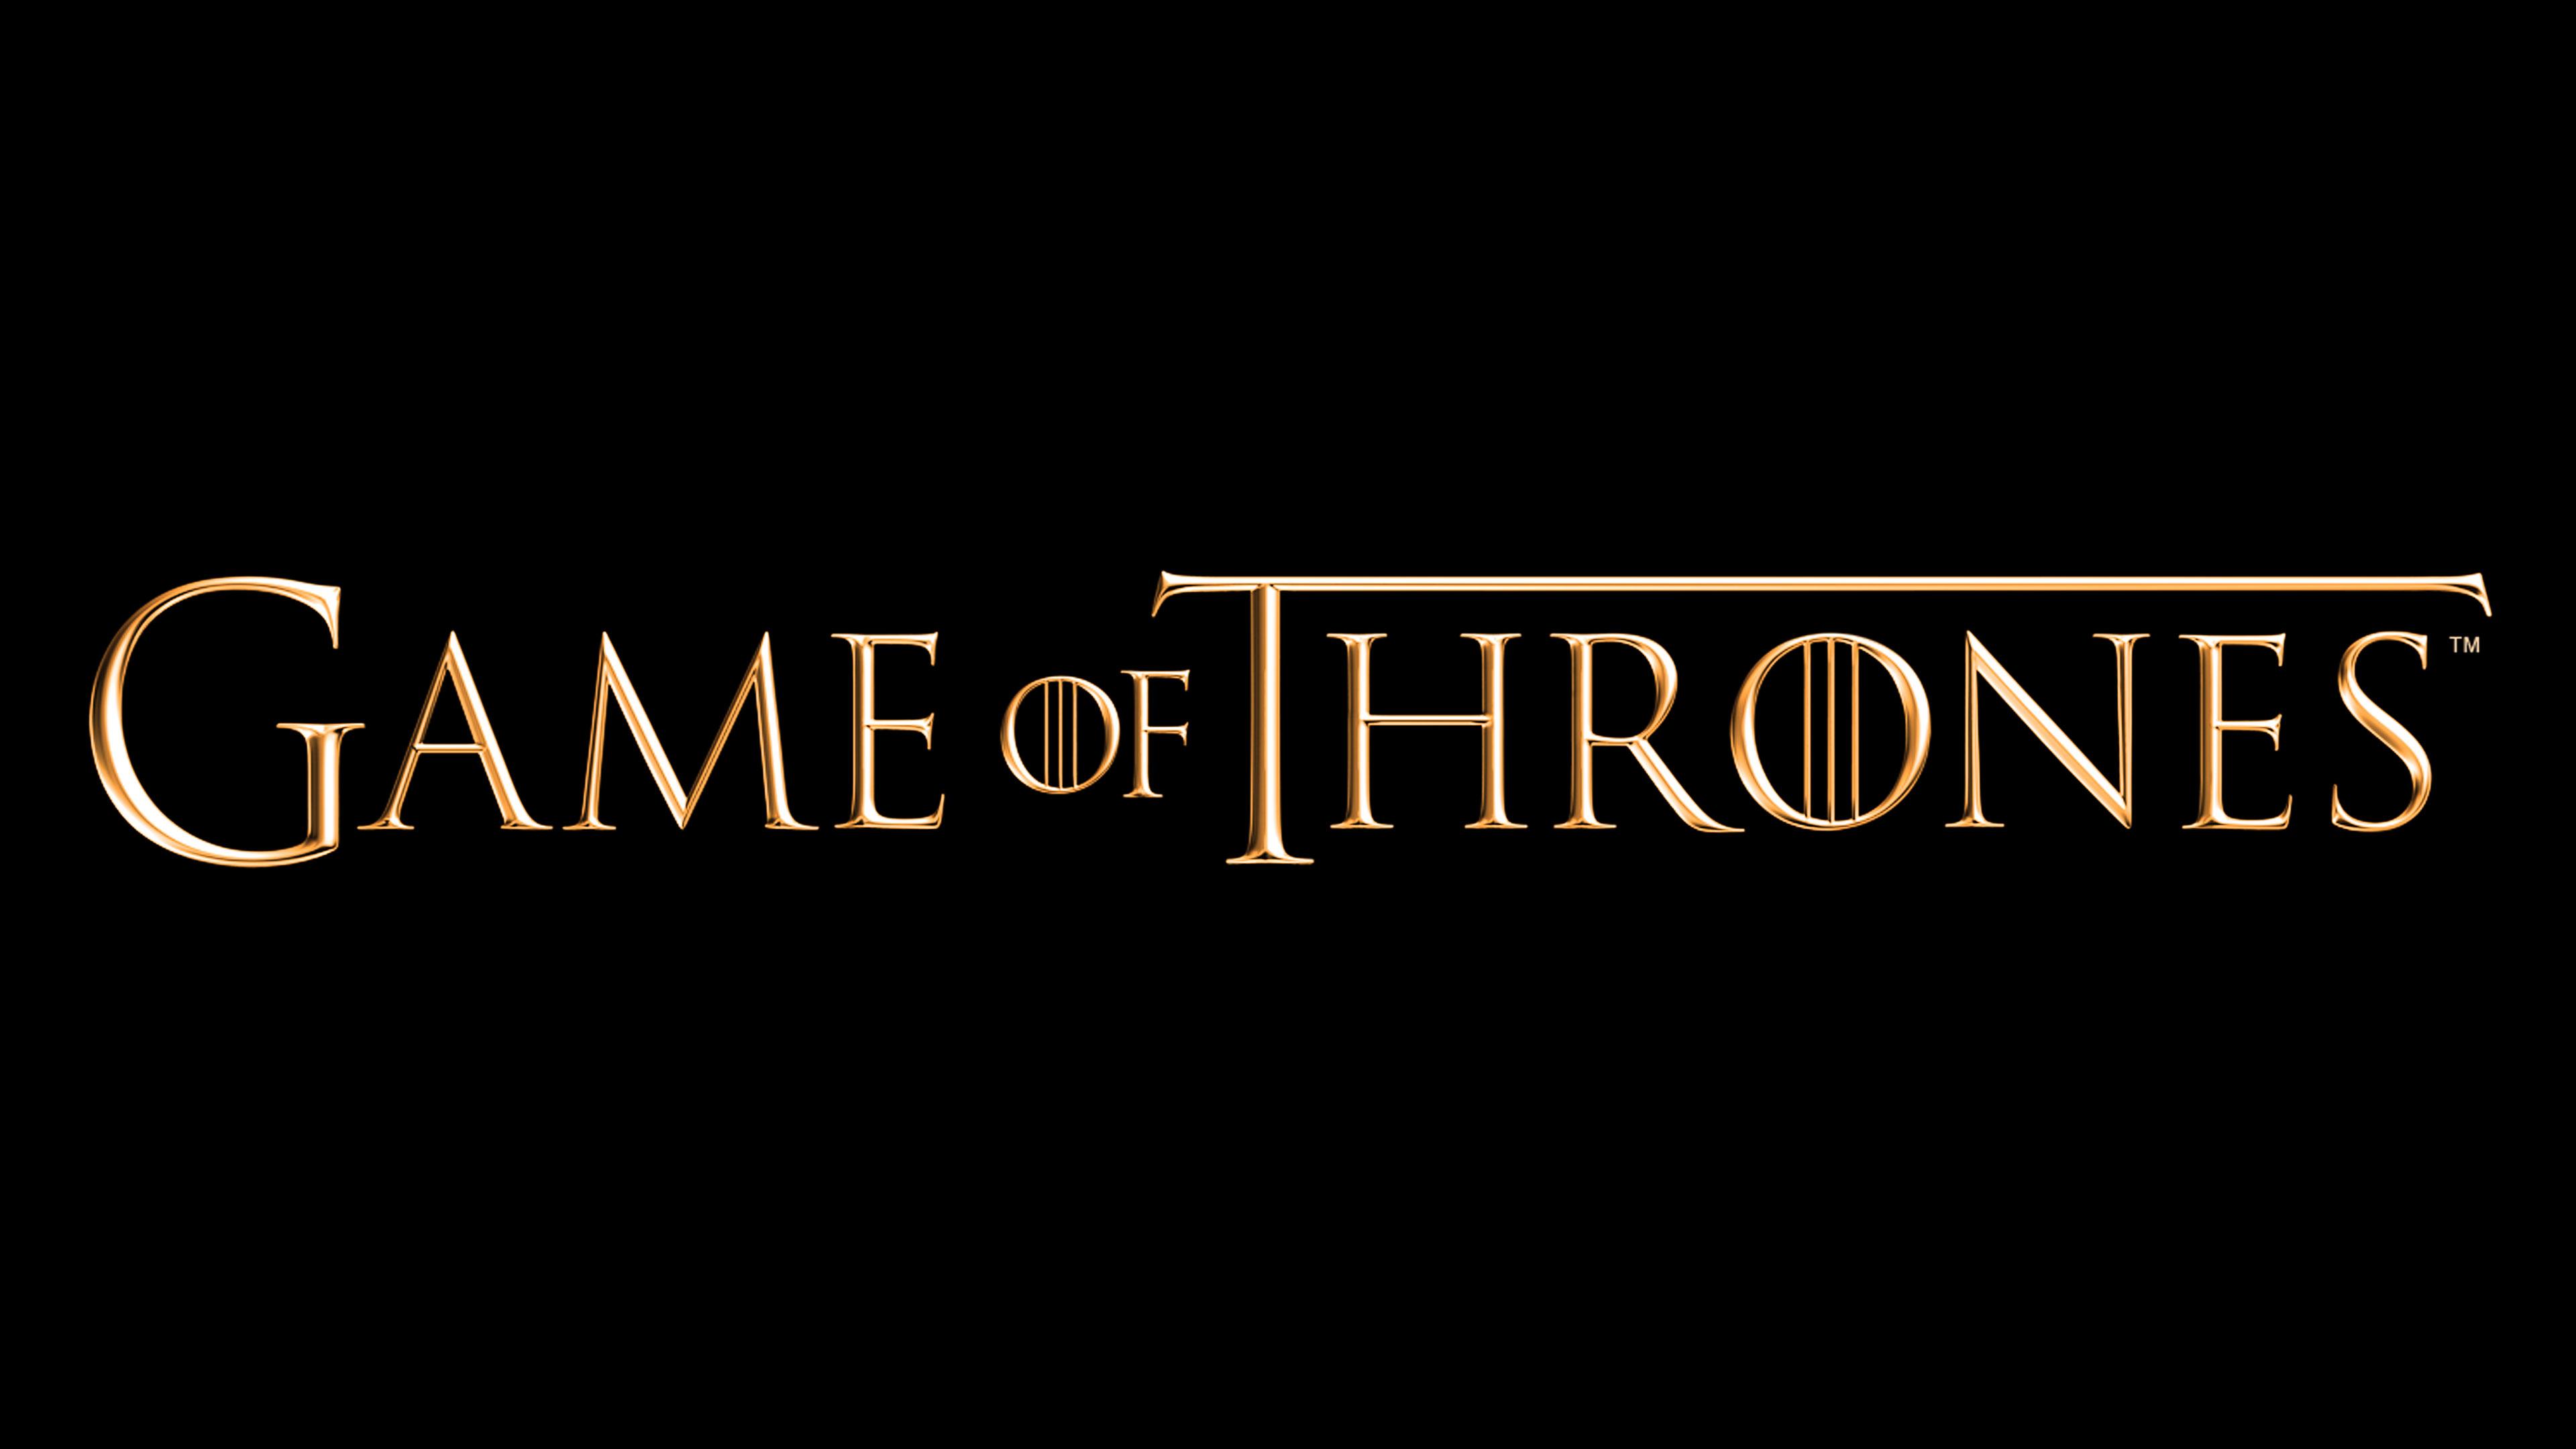 Game of Thrones Logo photo - 1